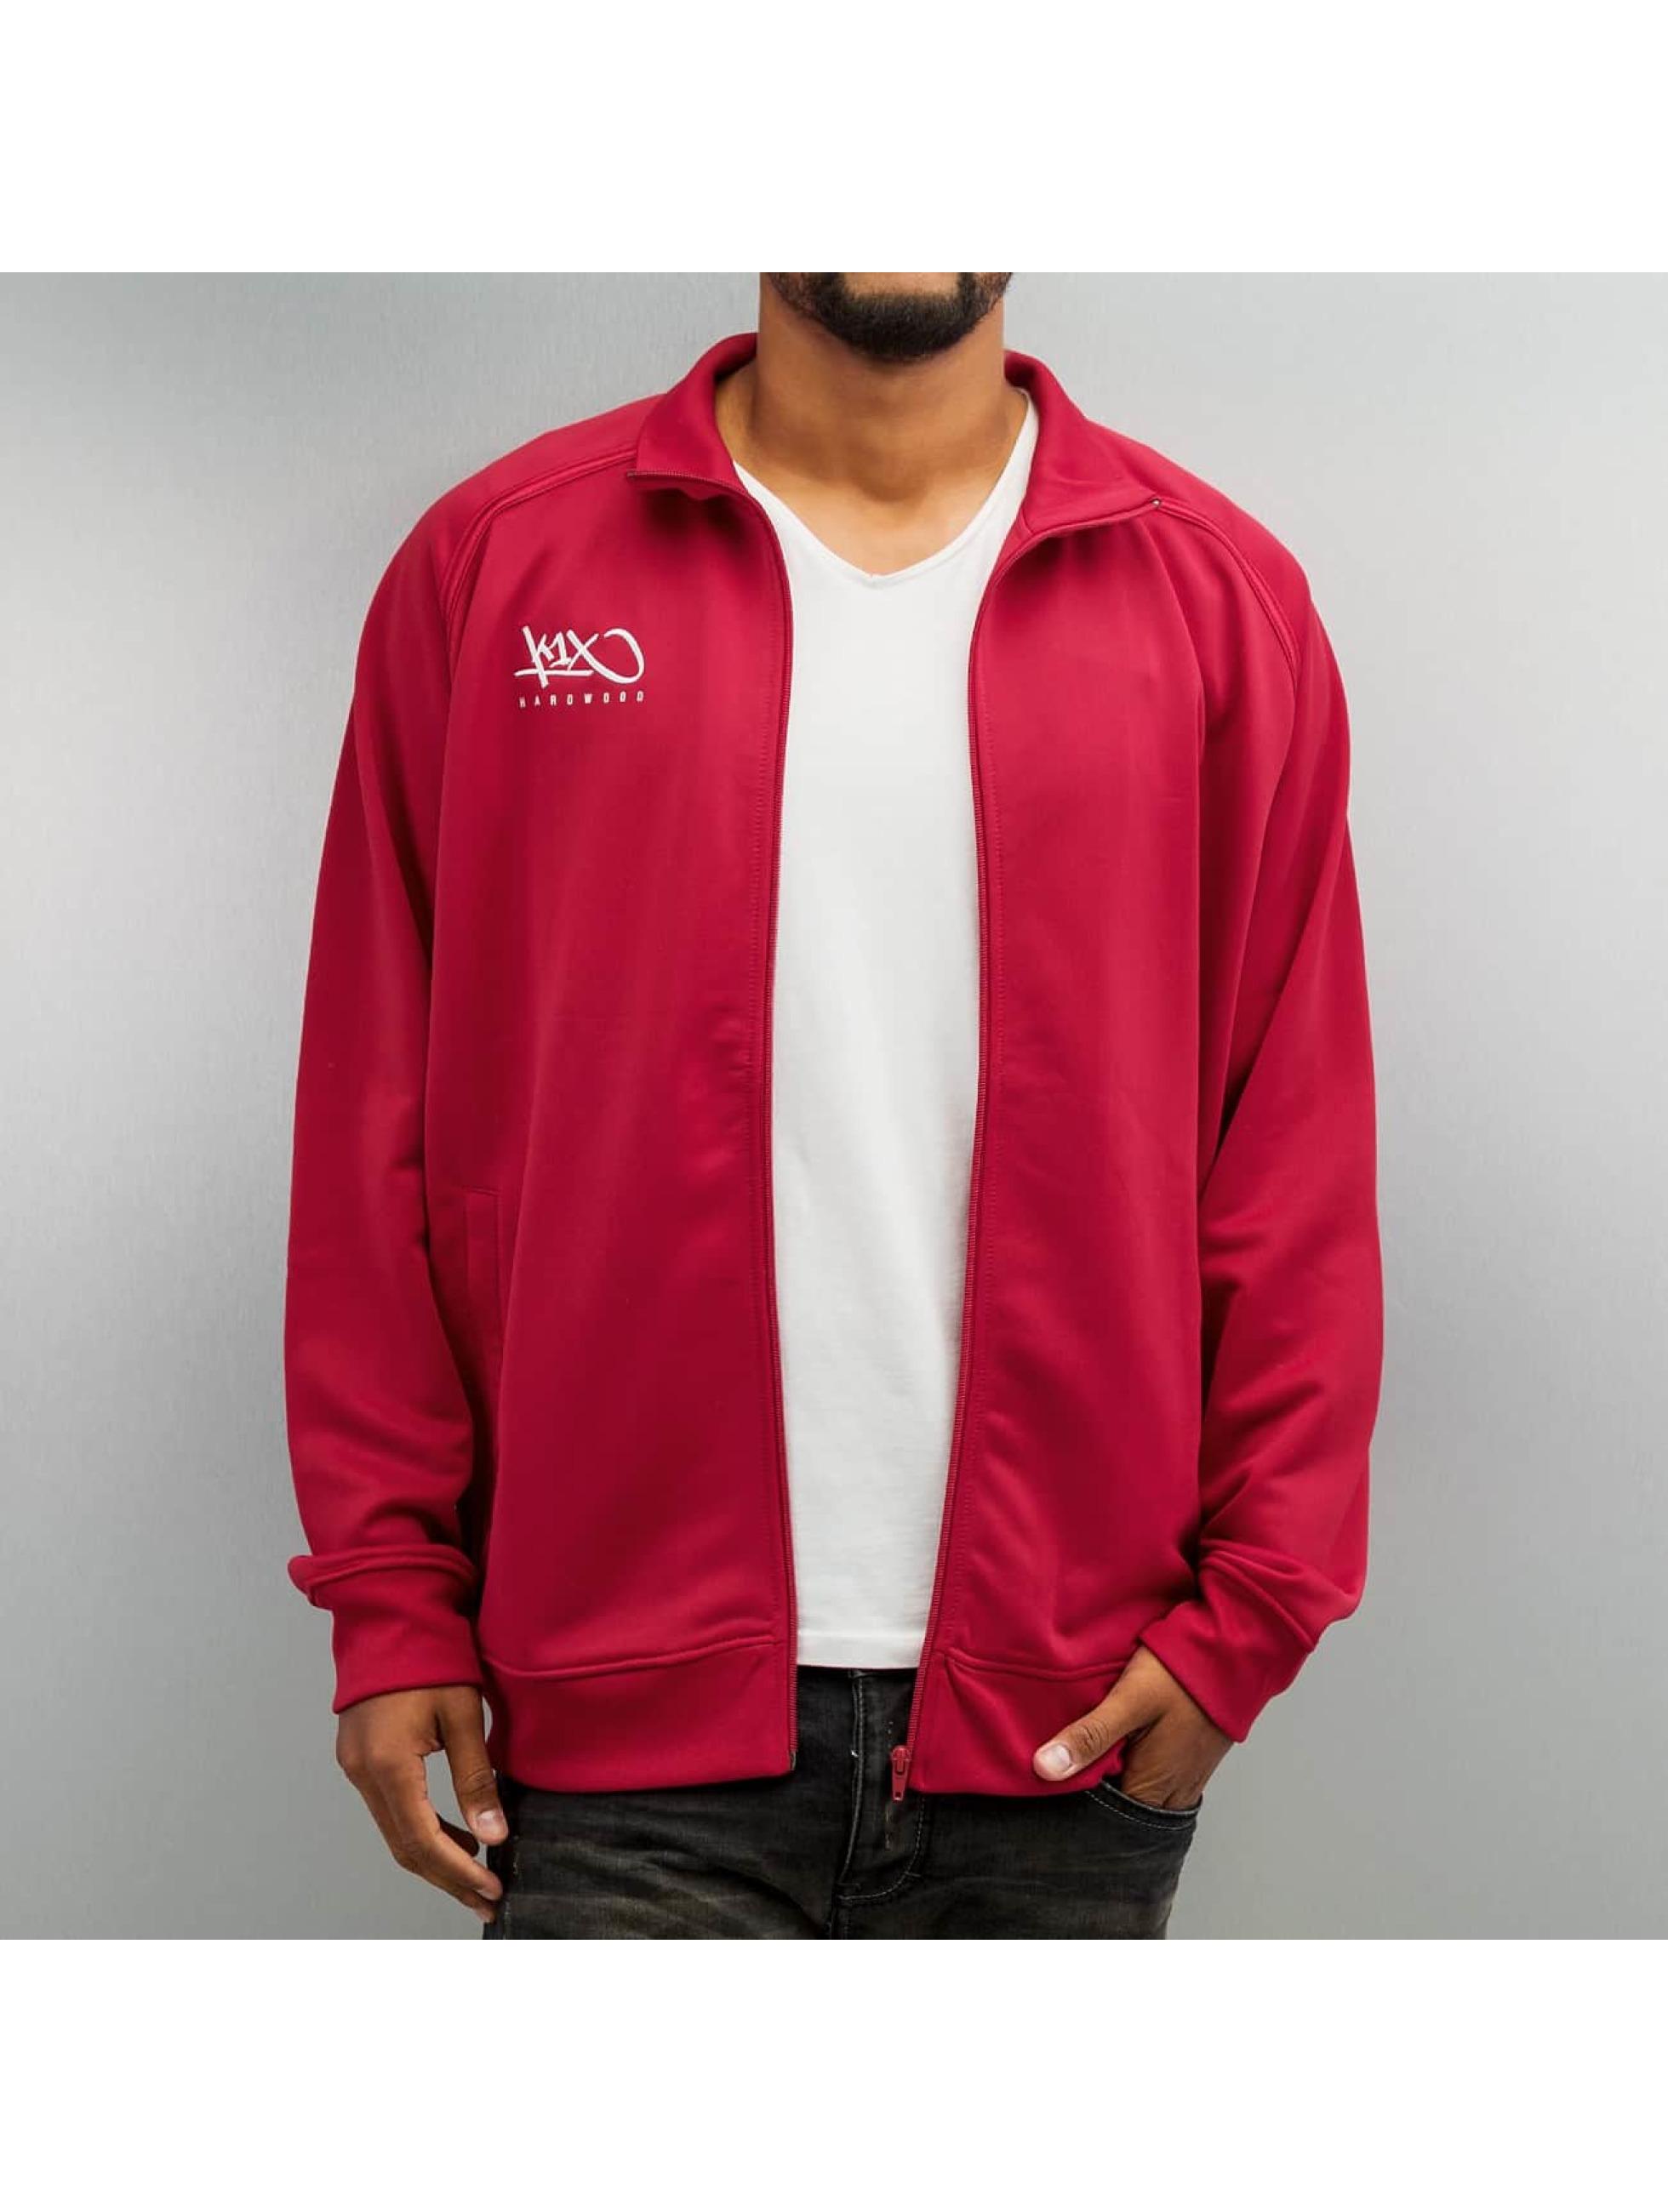 K1X Transitional Jackets Hardwood Intimidator Warm Up red